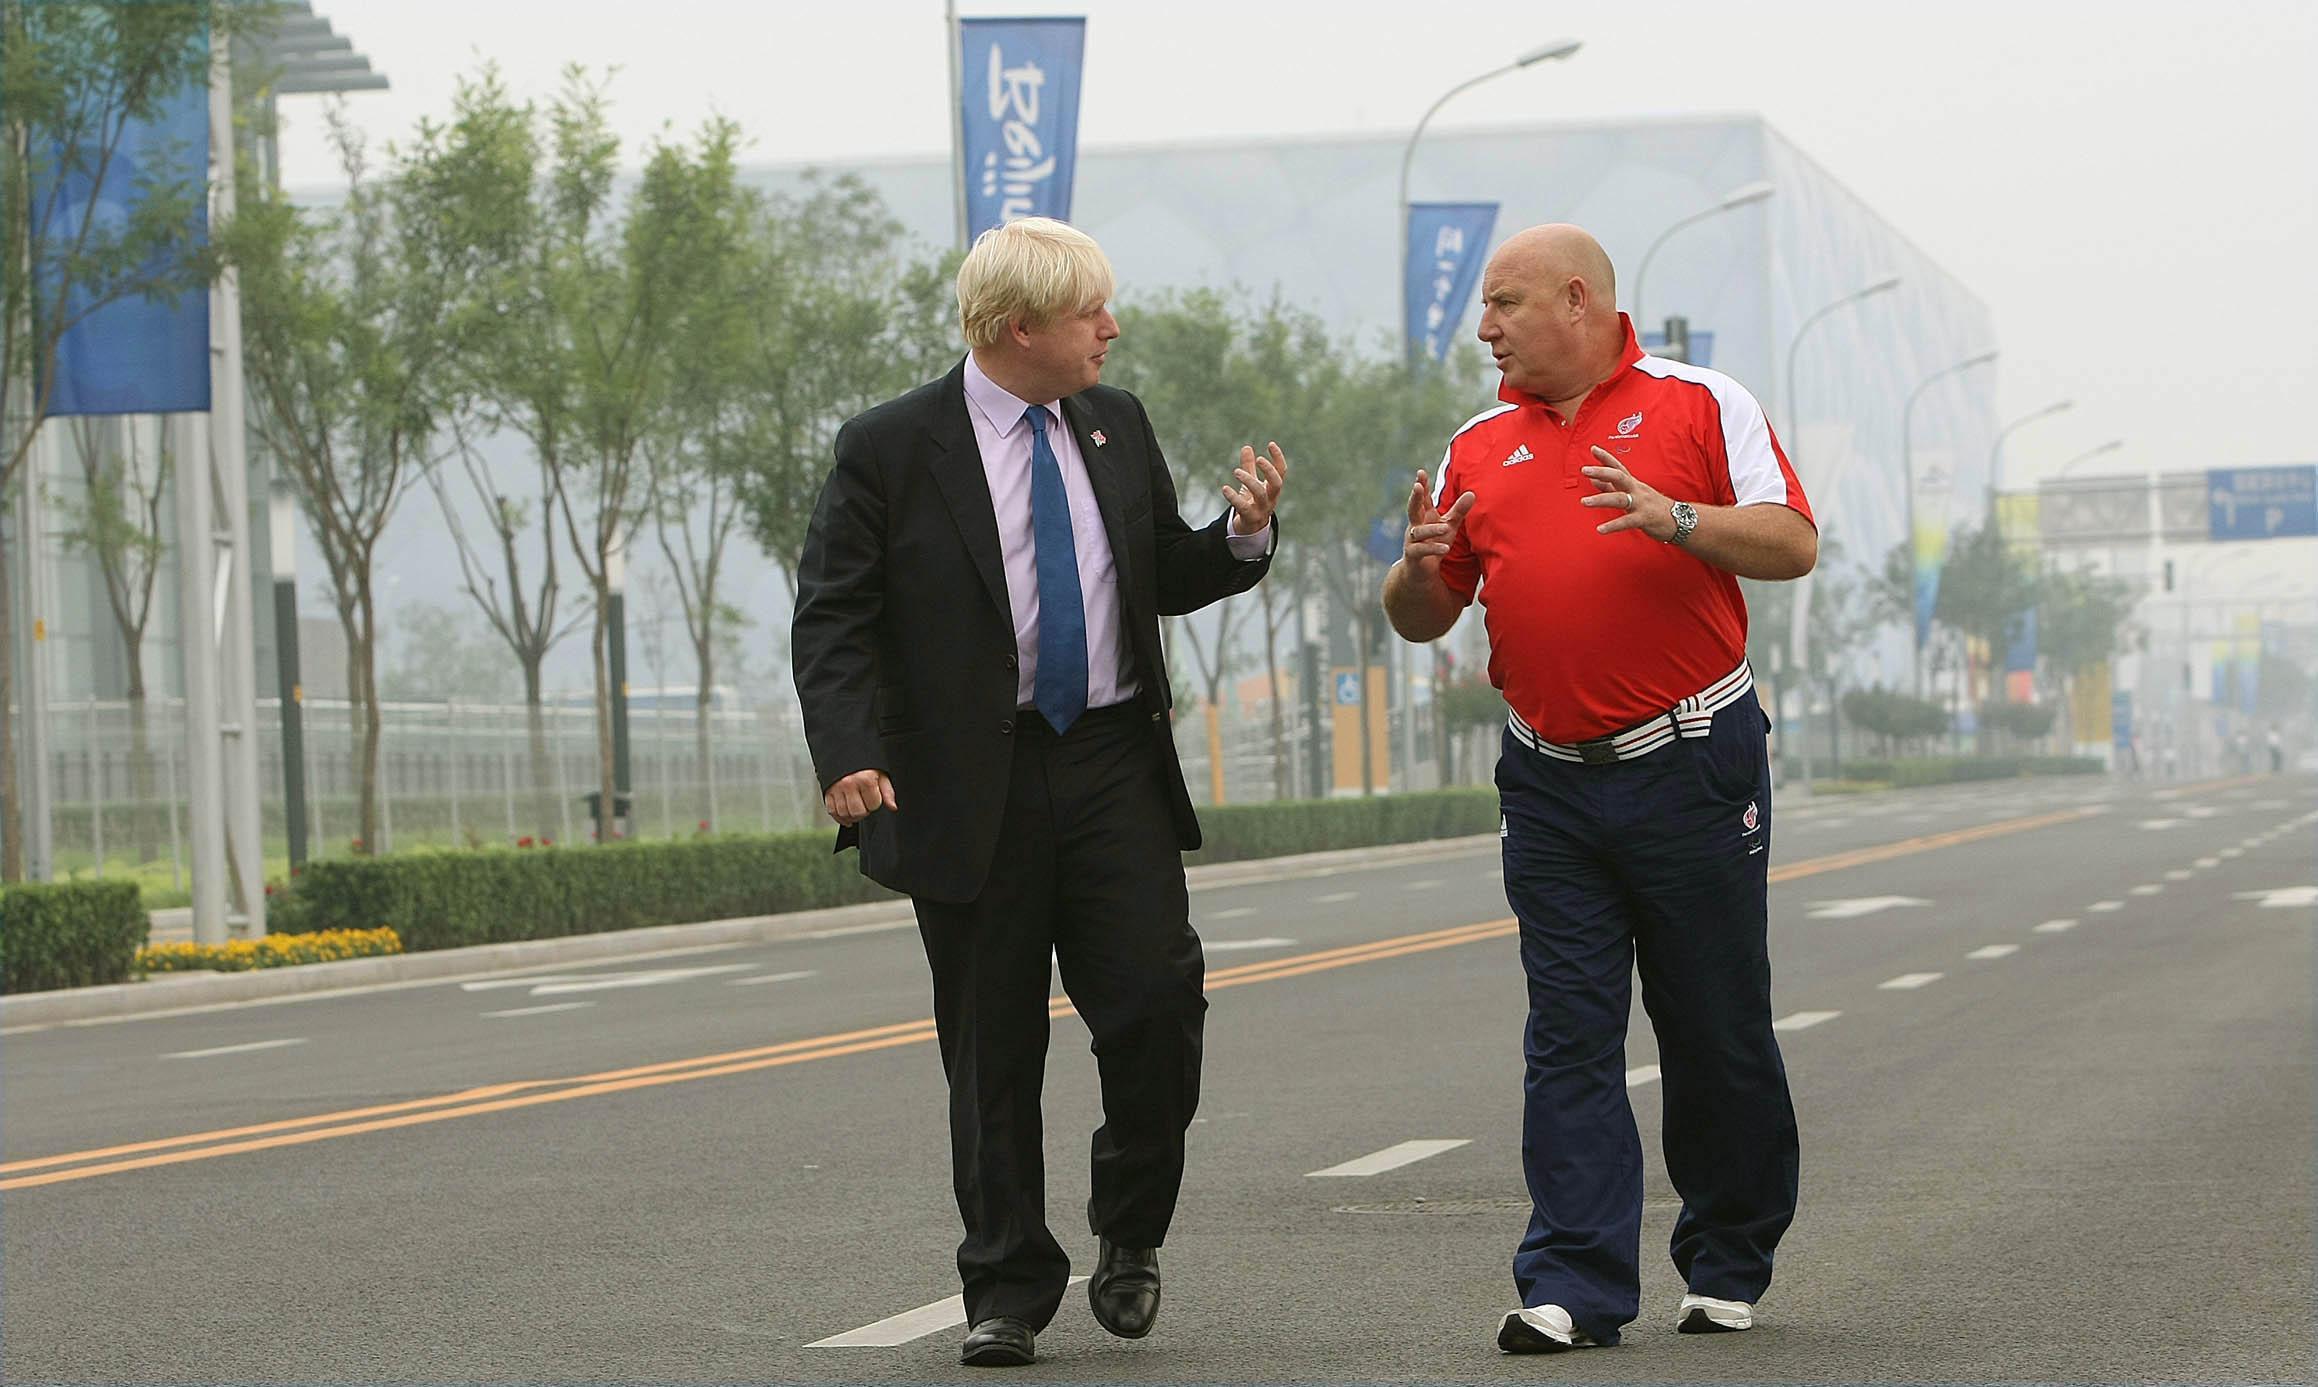 Mayor of London Boris Johnson (left) with Team GB Chef De Mission Phil Lane in Beijing, China.